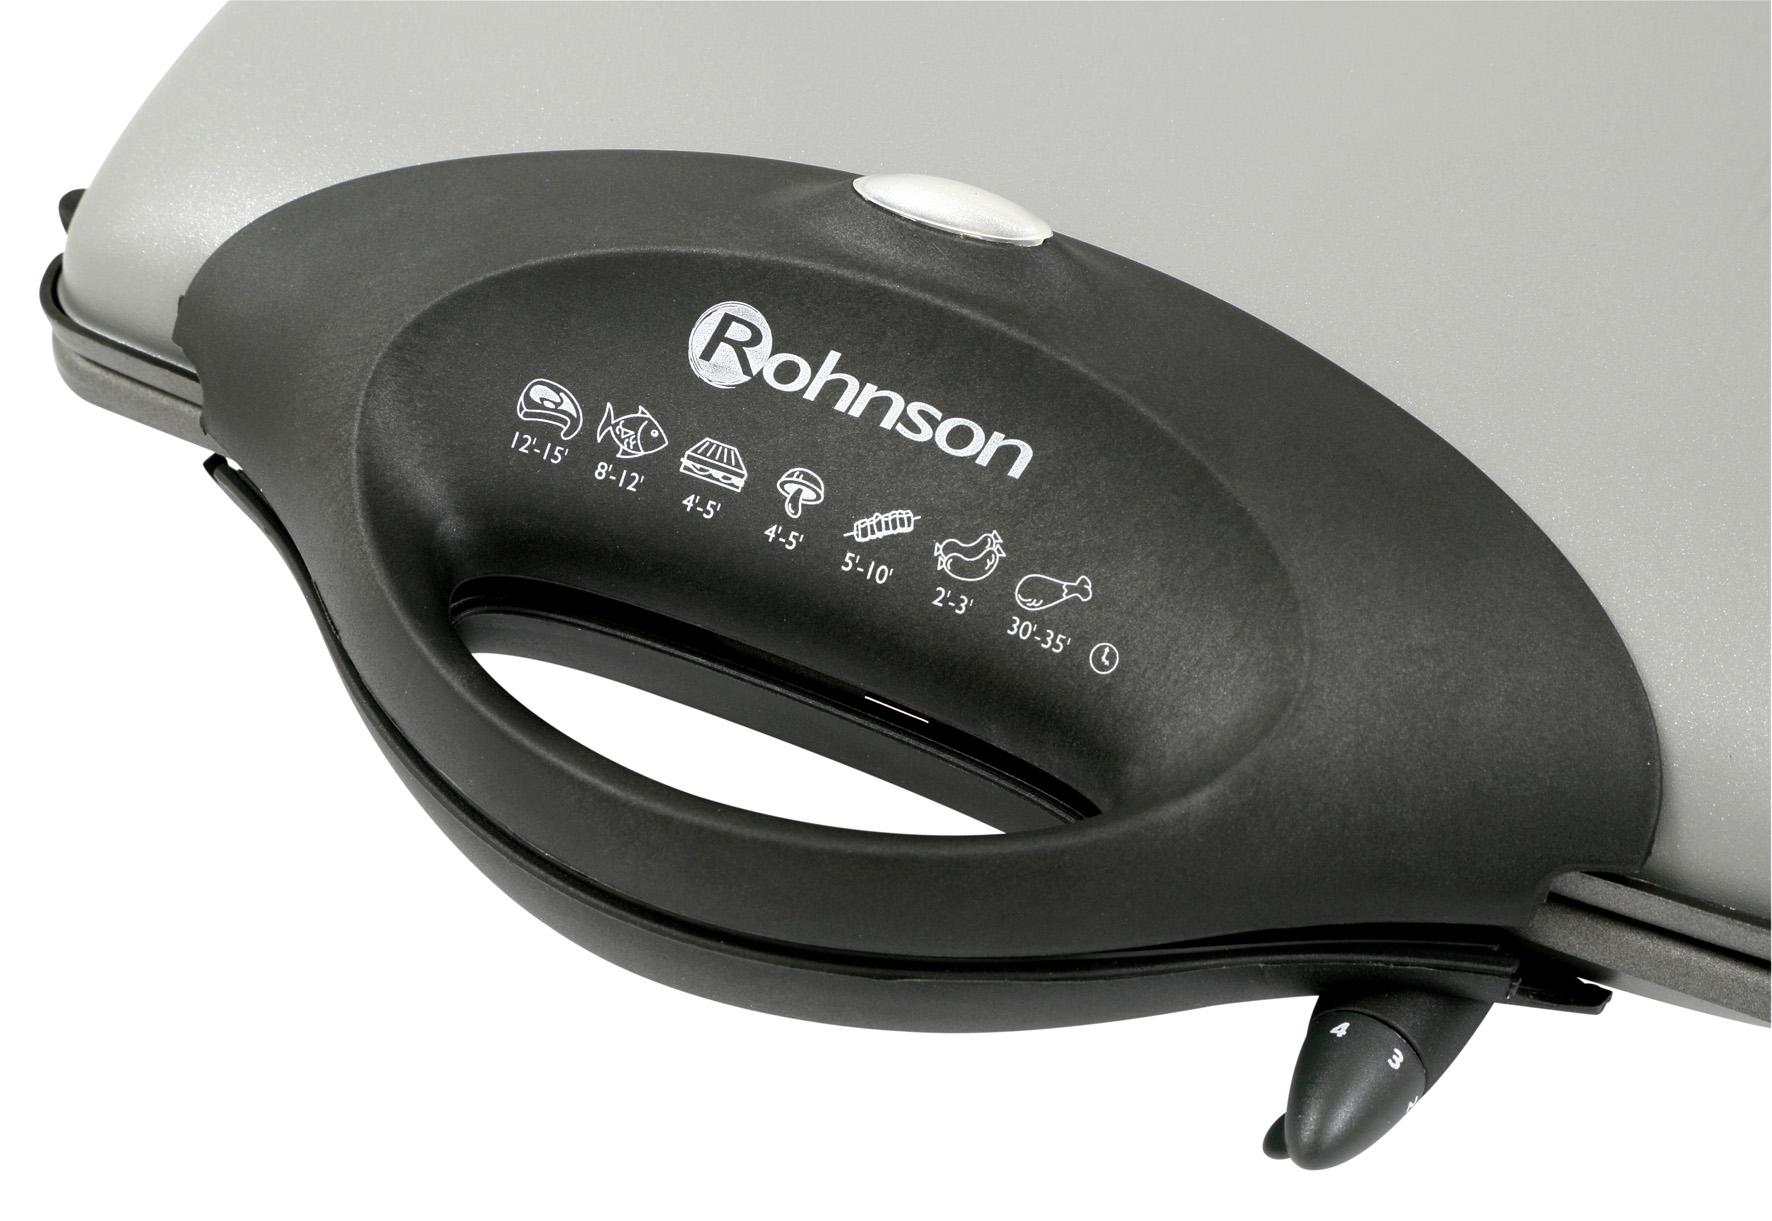 Rohnson R-234